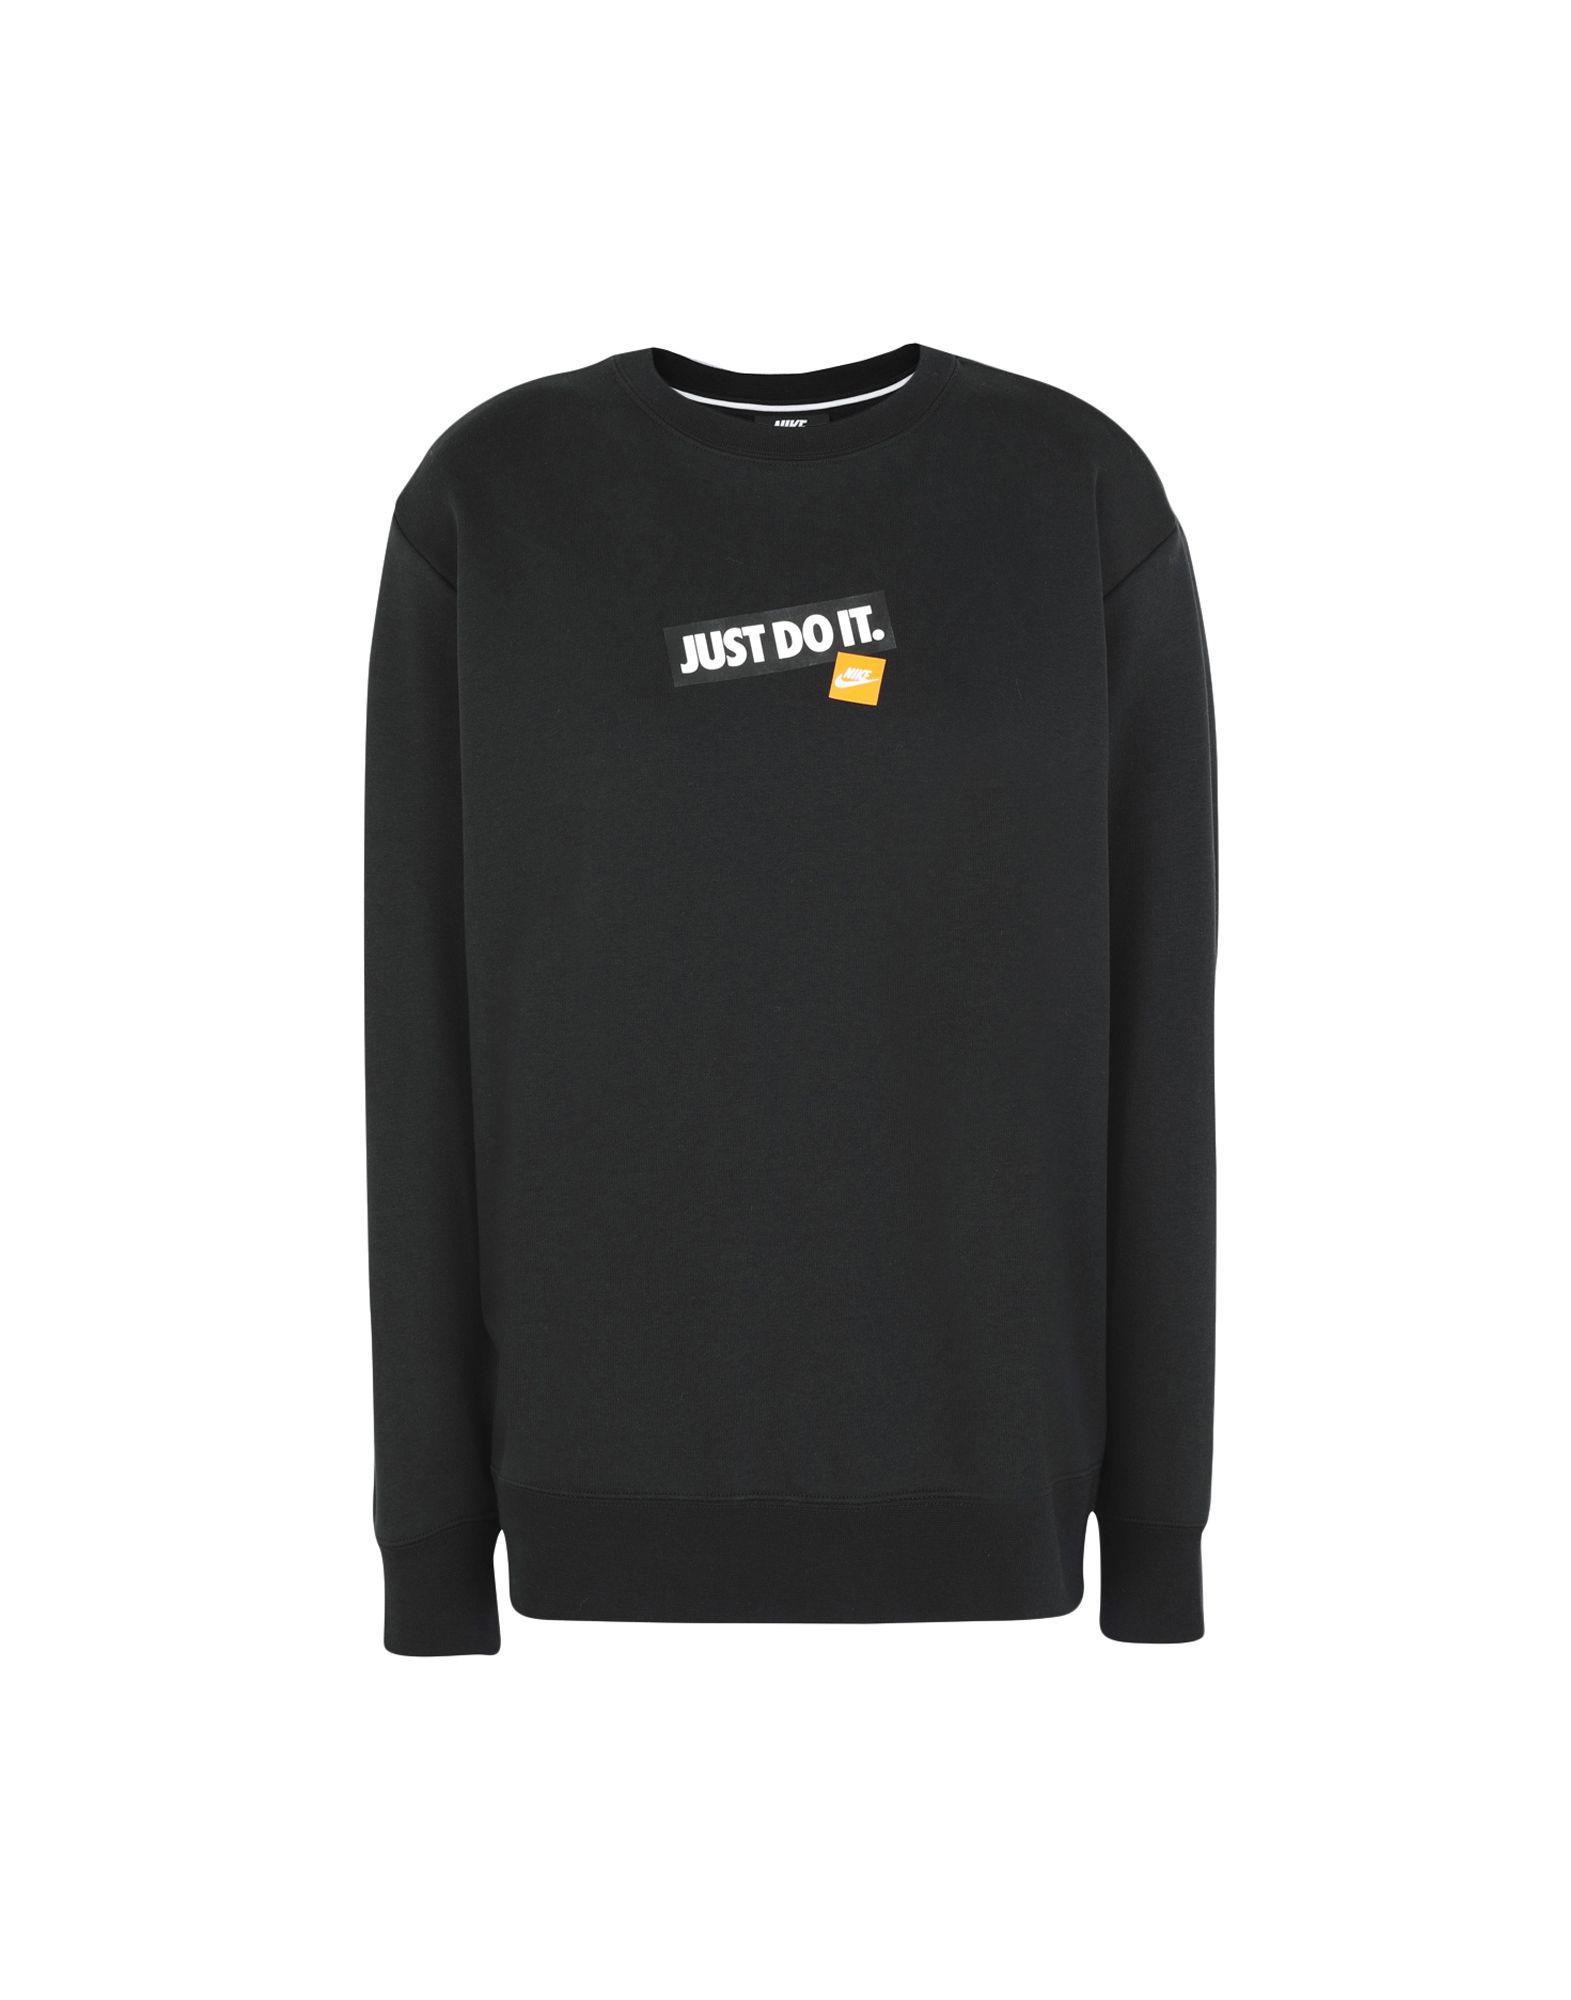 eb25c93d Nike Sweatshirt in Black - Lyst